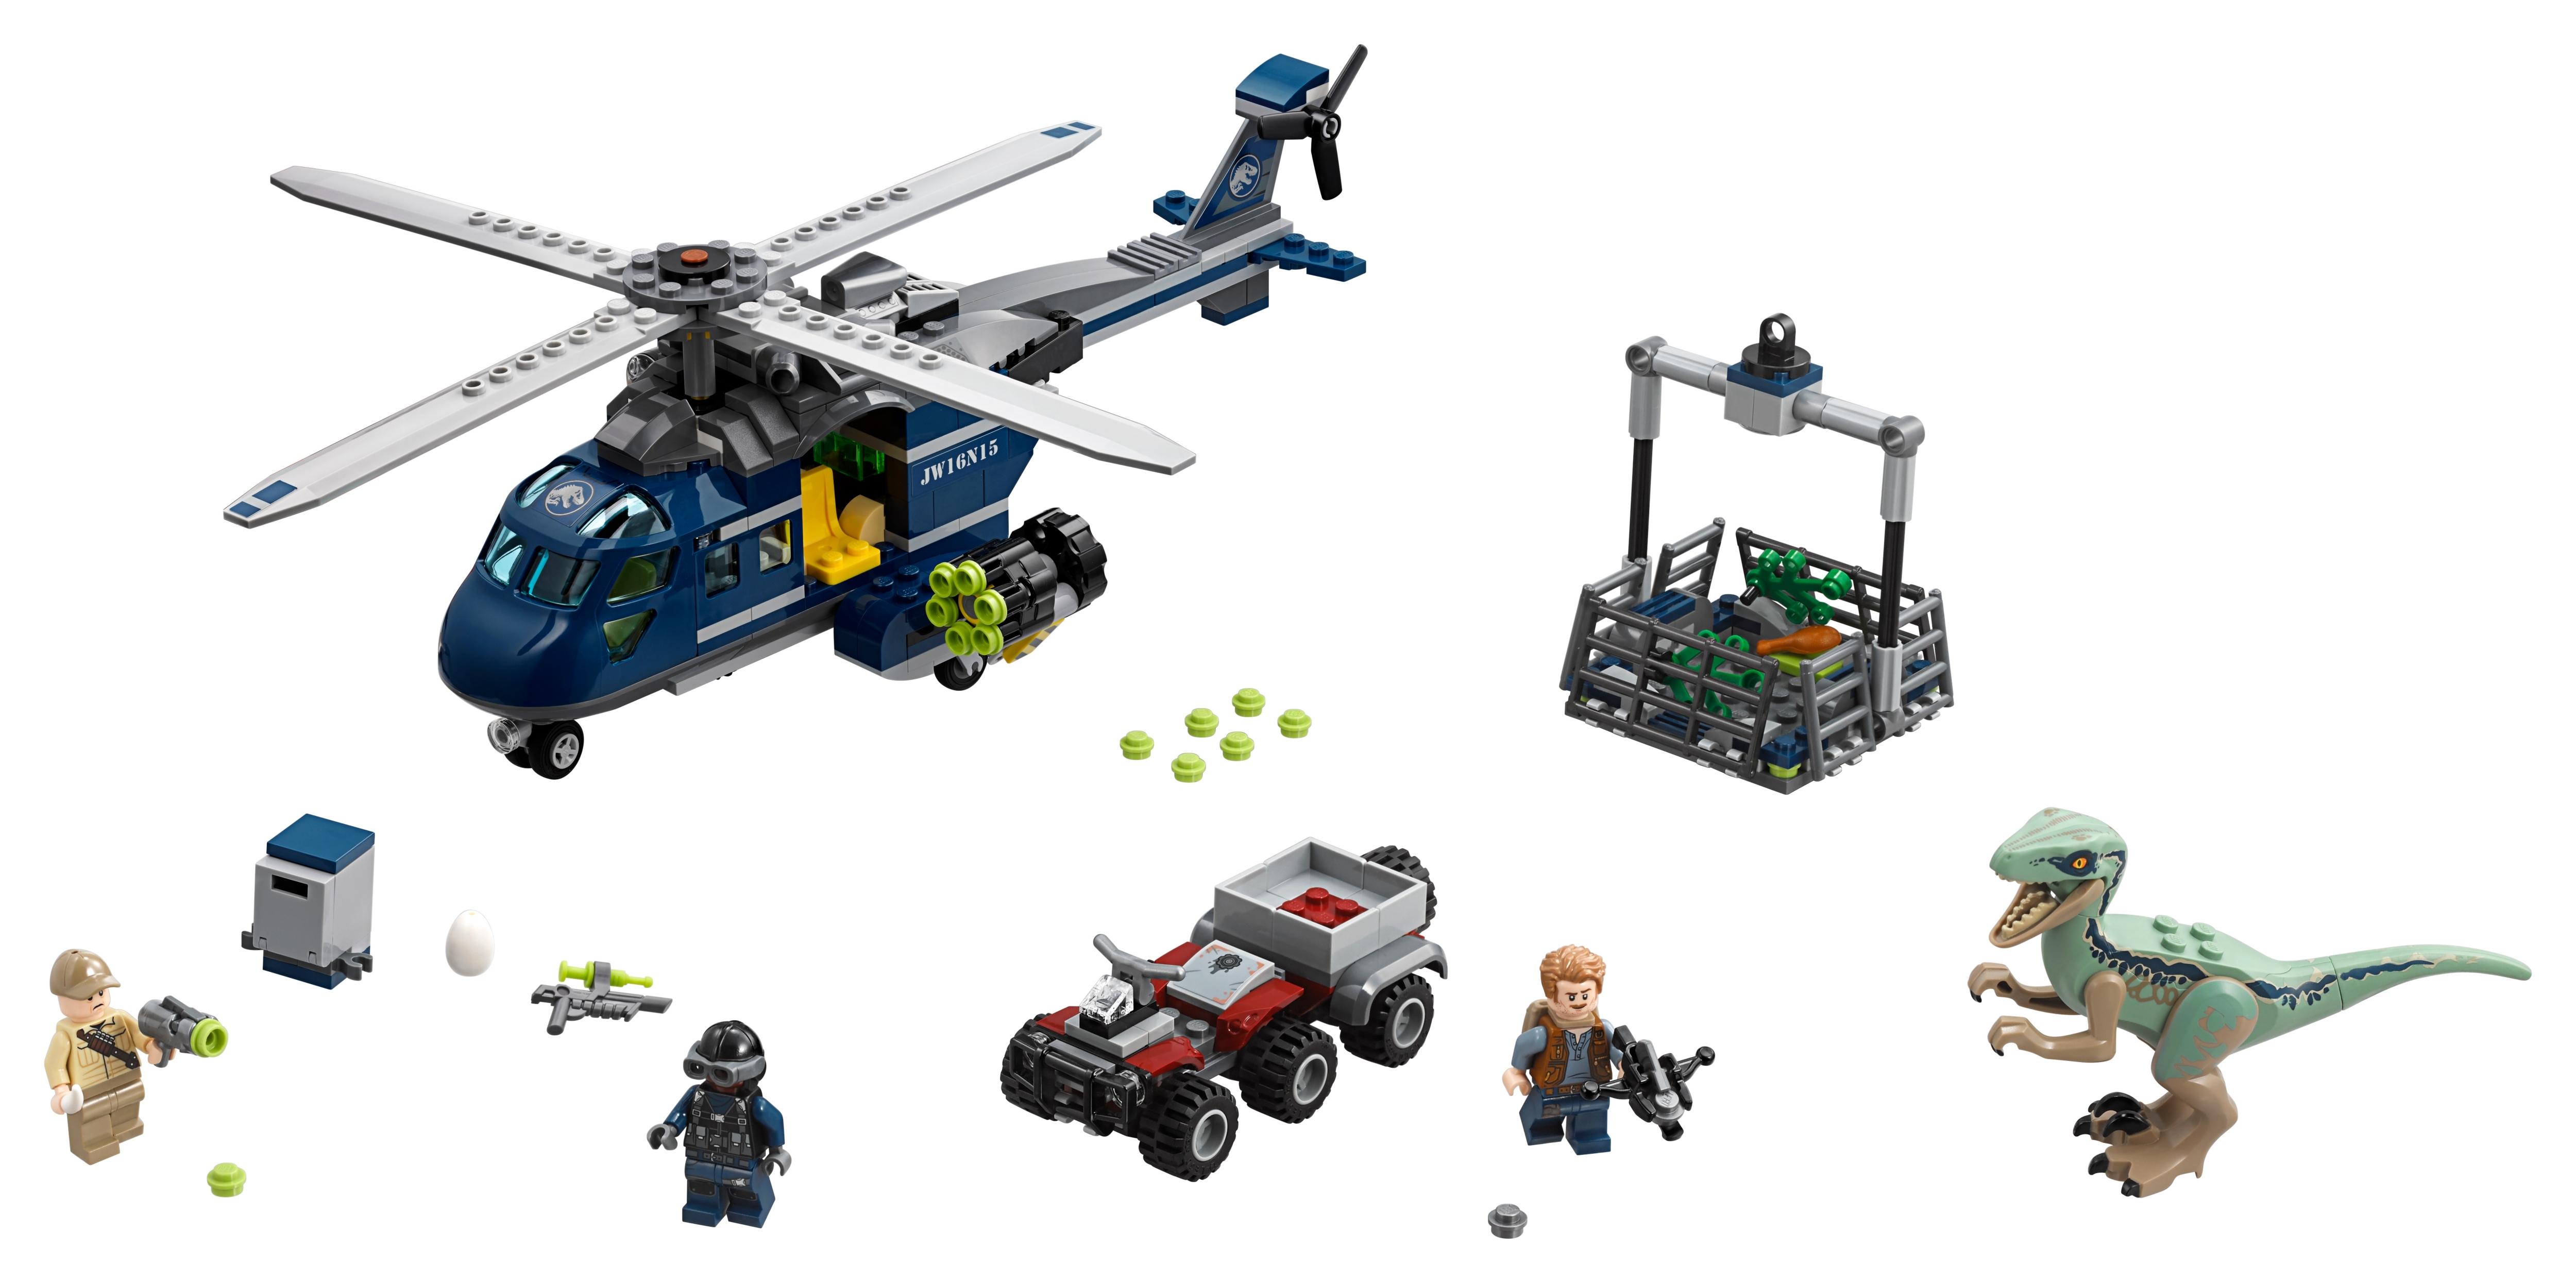 Lego 75928 Jurassic World Blue/'s helicóptero Pursuit set